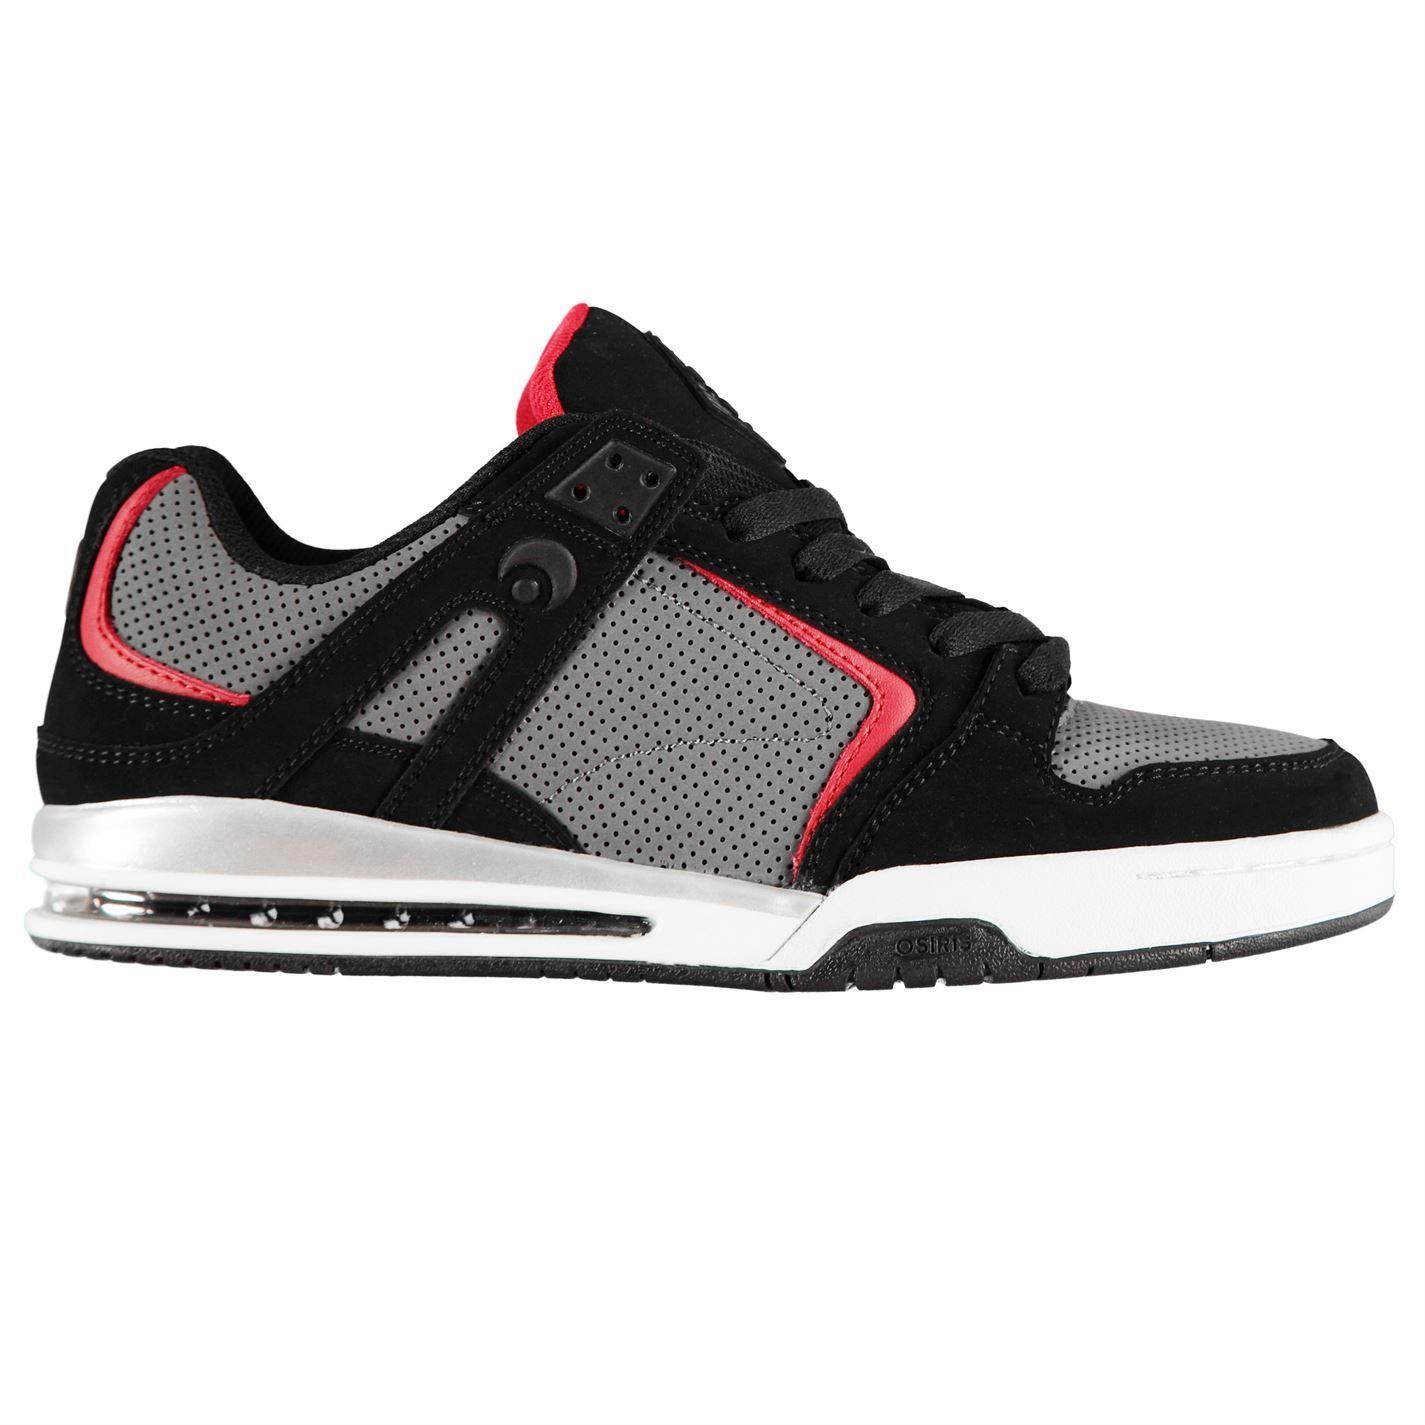 Osiris PXL Mens Skate Shoes Trainers